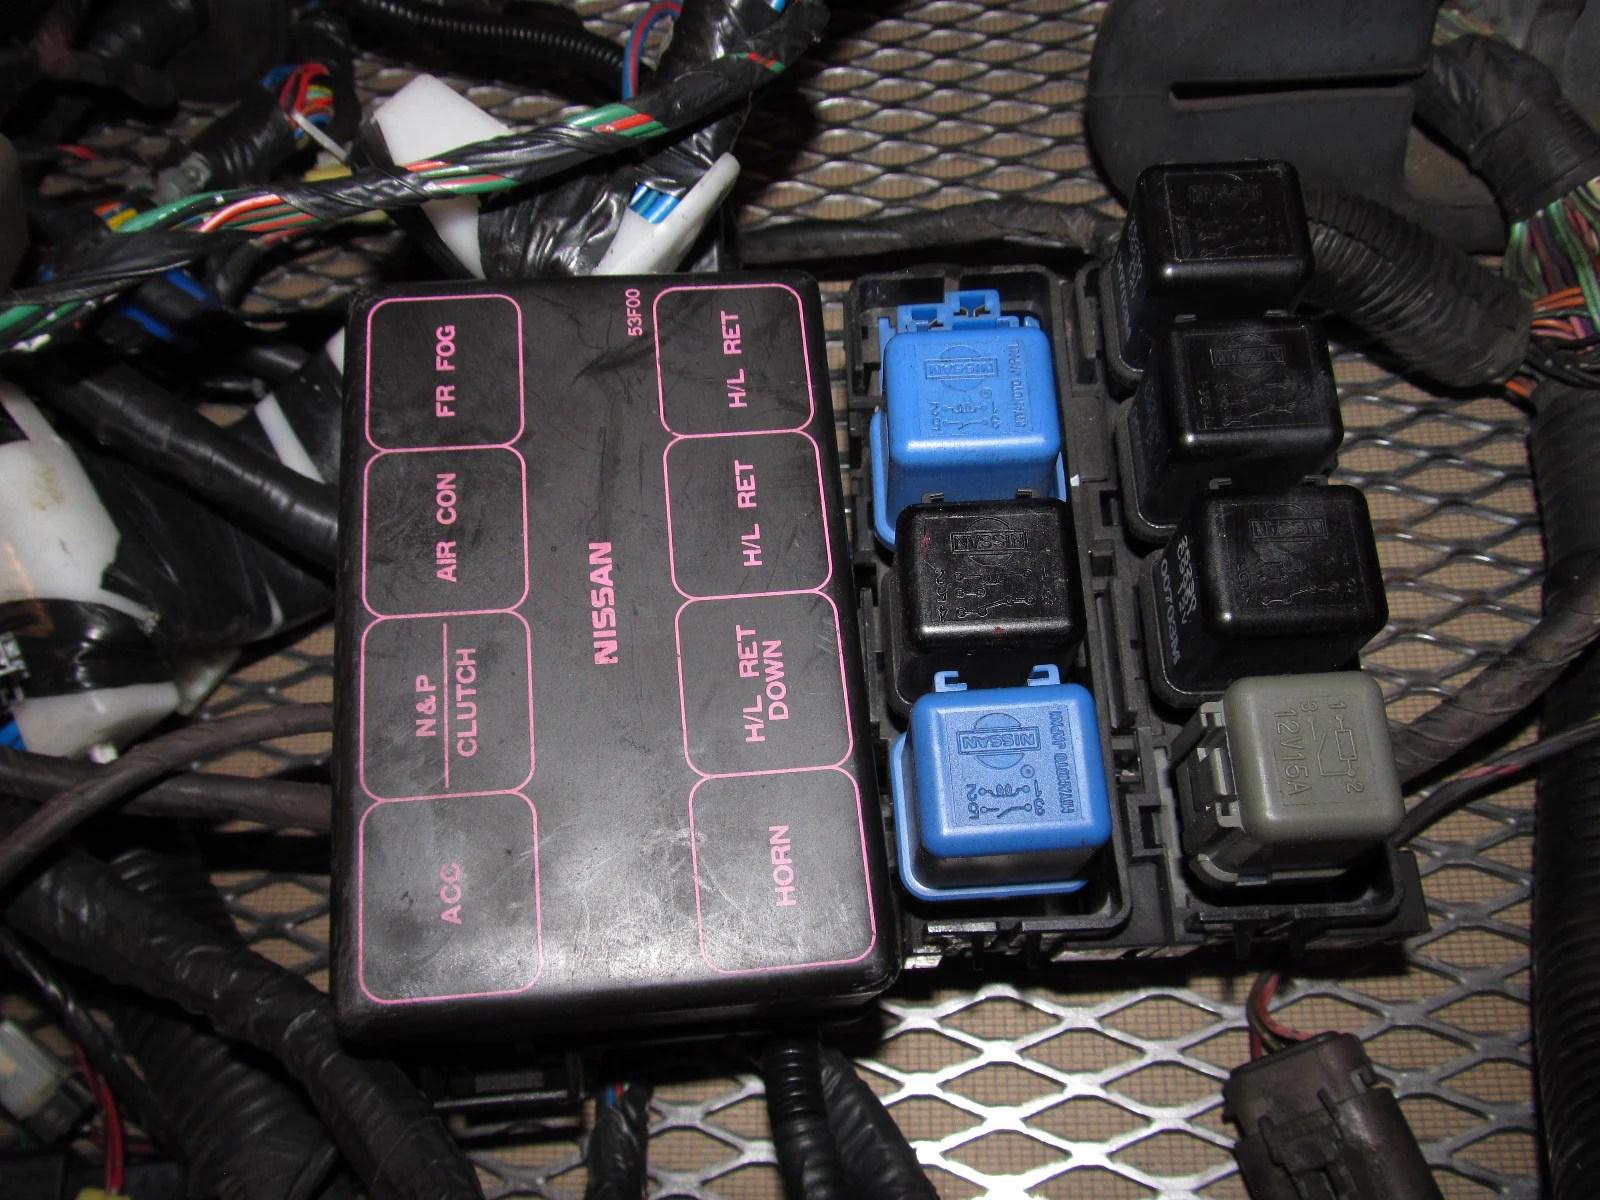 240sx fuse box wiring diagram todays honda accord fuse box 89 240sx fuse box pinout [ 1600 x 1200 Pixel ]